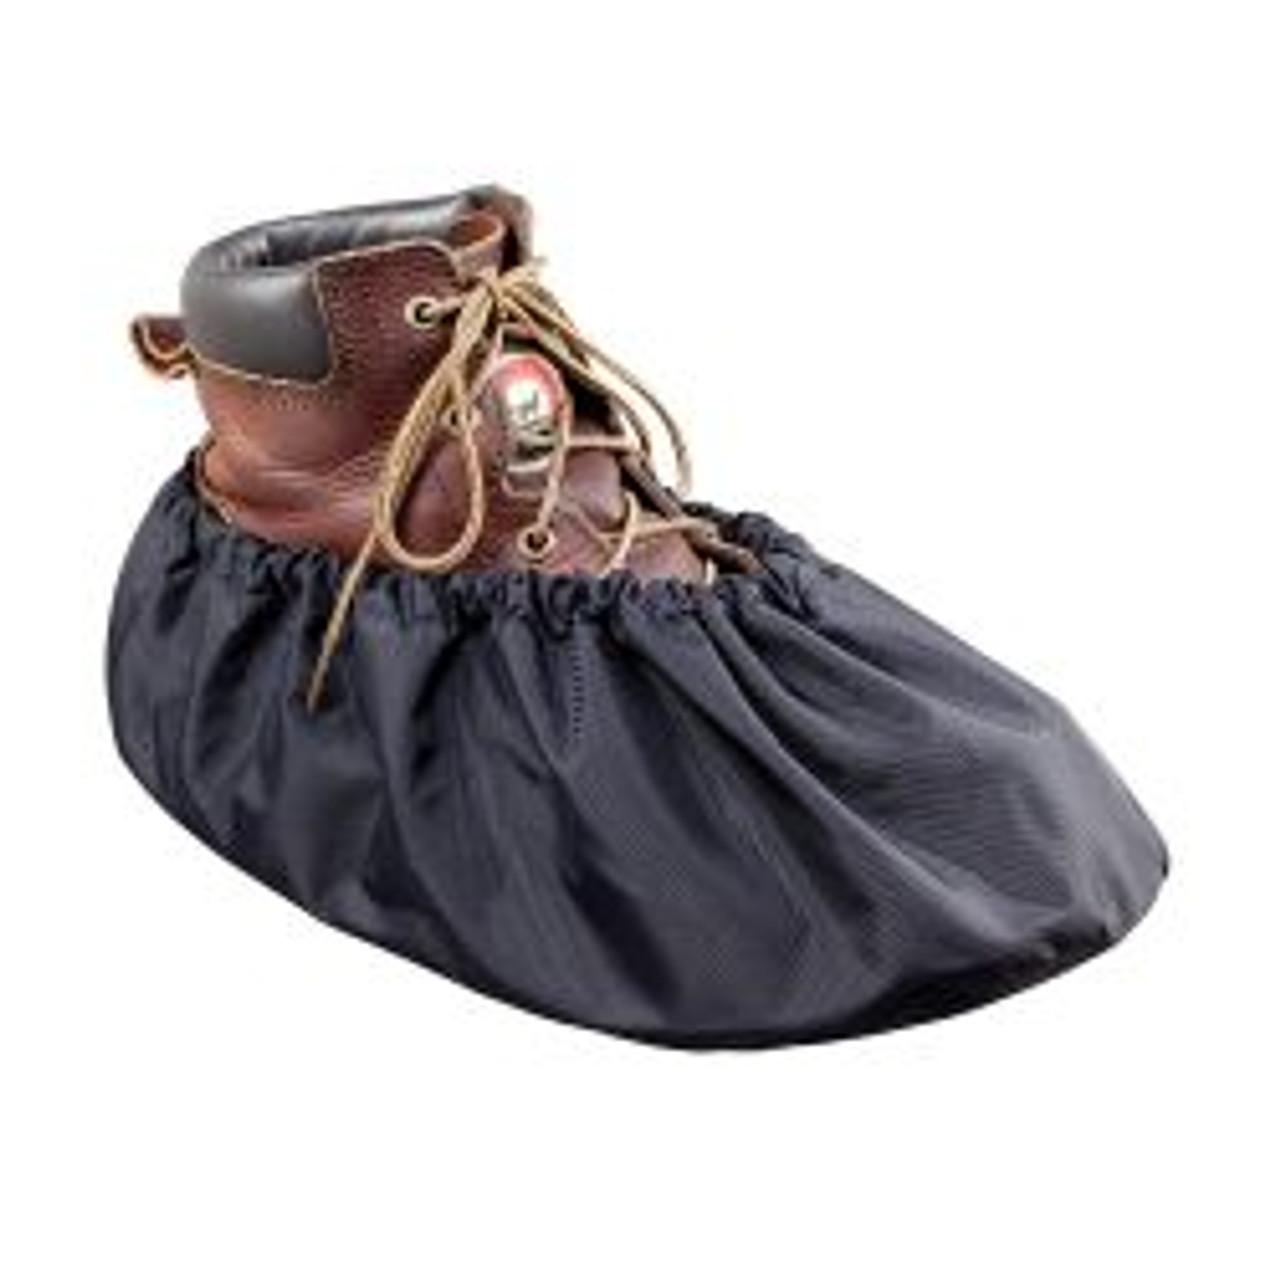 Klein 55489 Tradesman Pro Shoe Covers X-Large